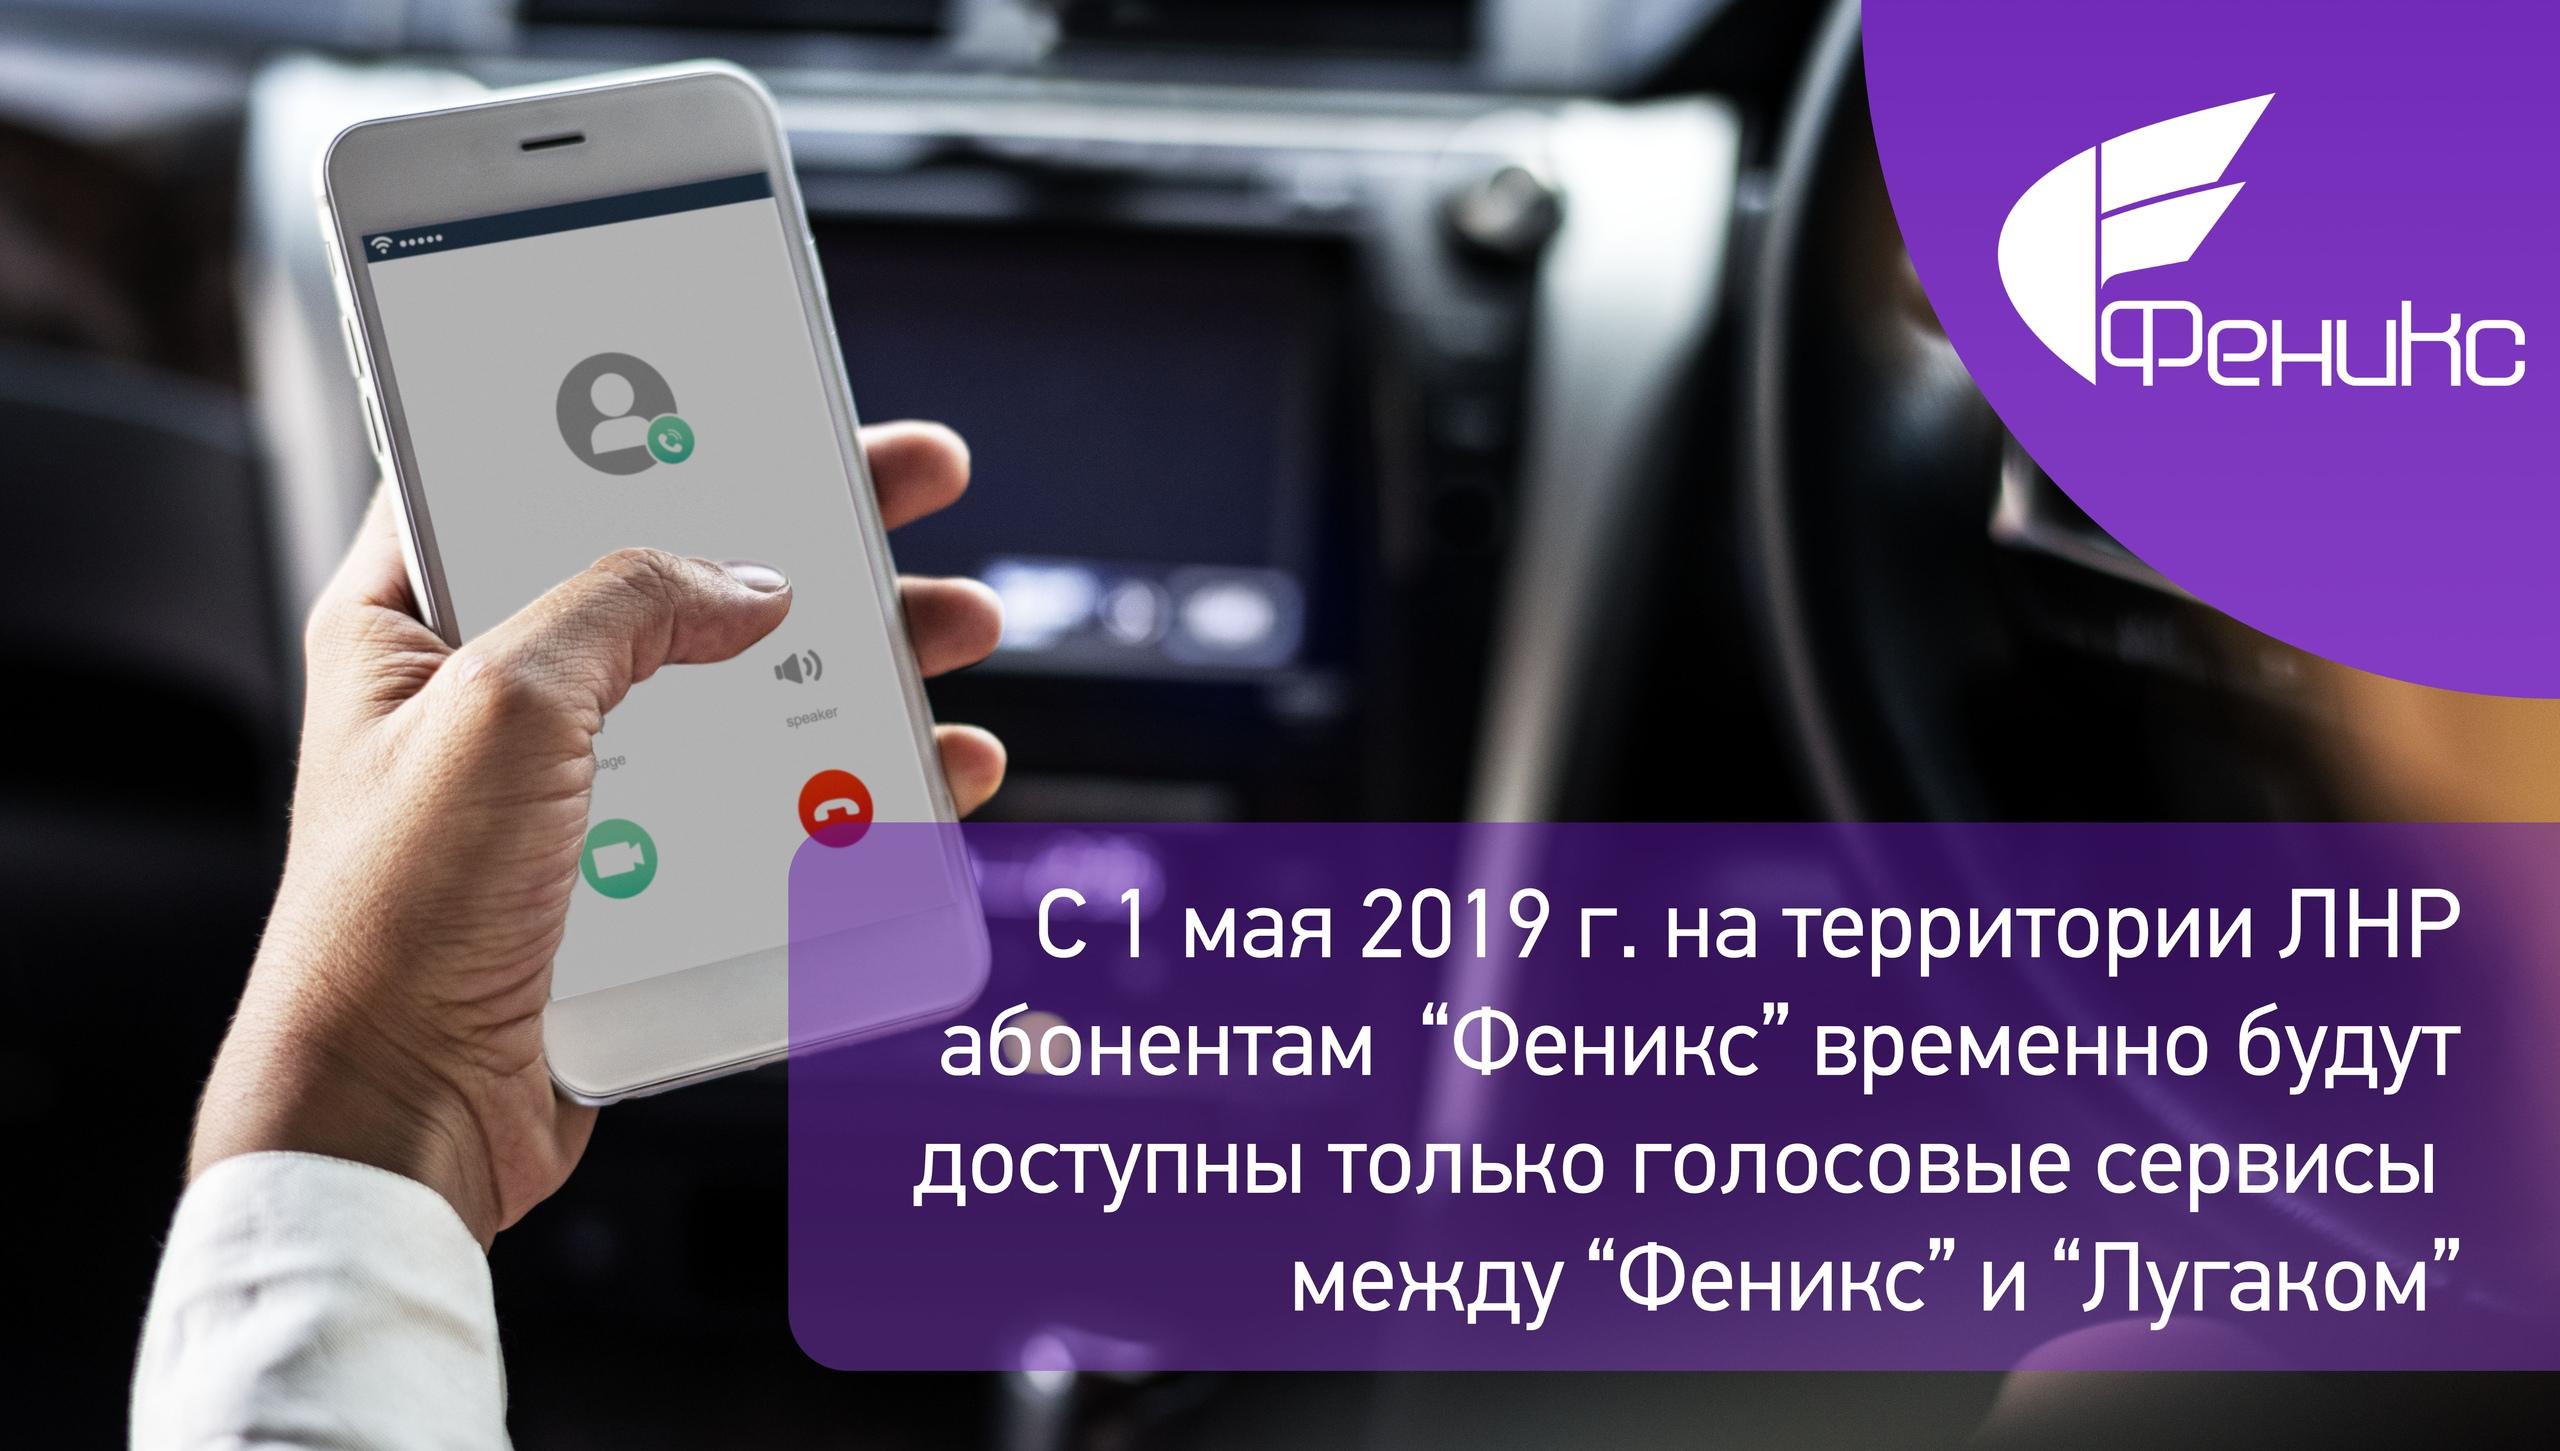 С1 мая 2019 г. на территории ЛНР абонентам